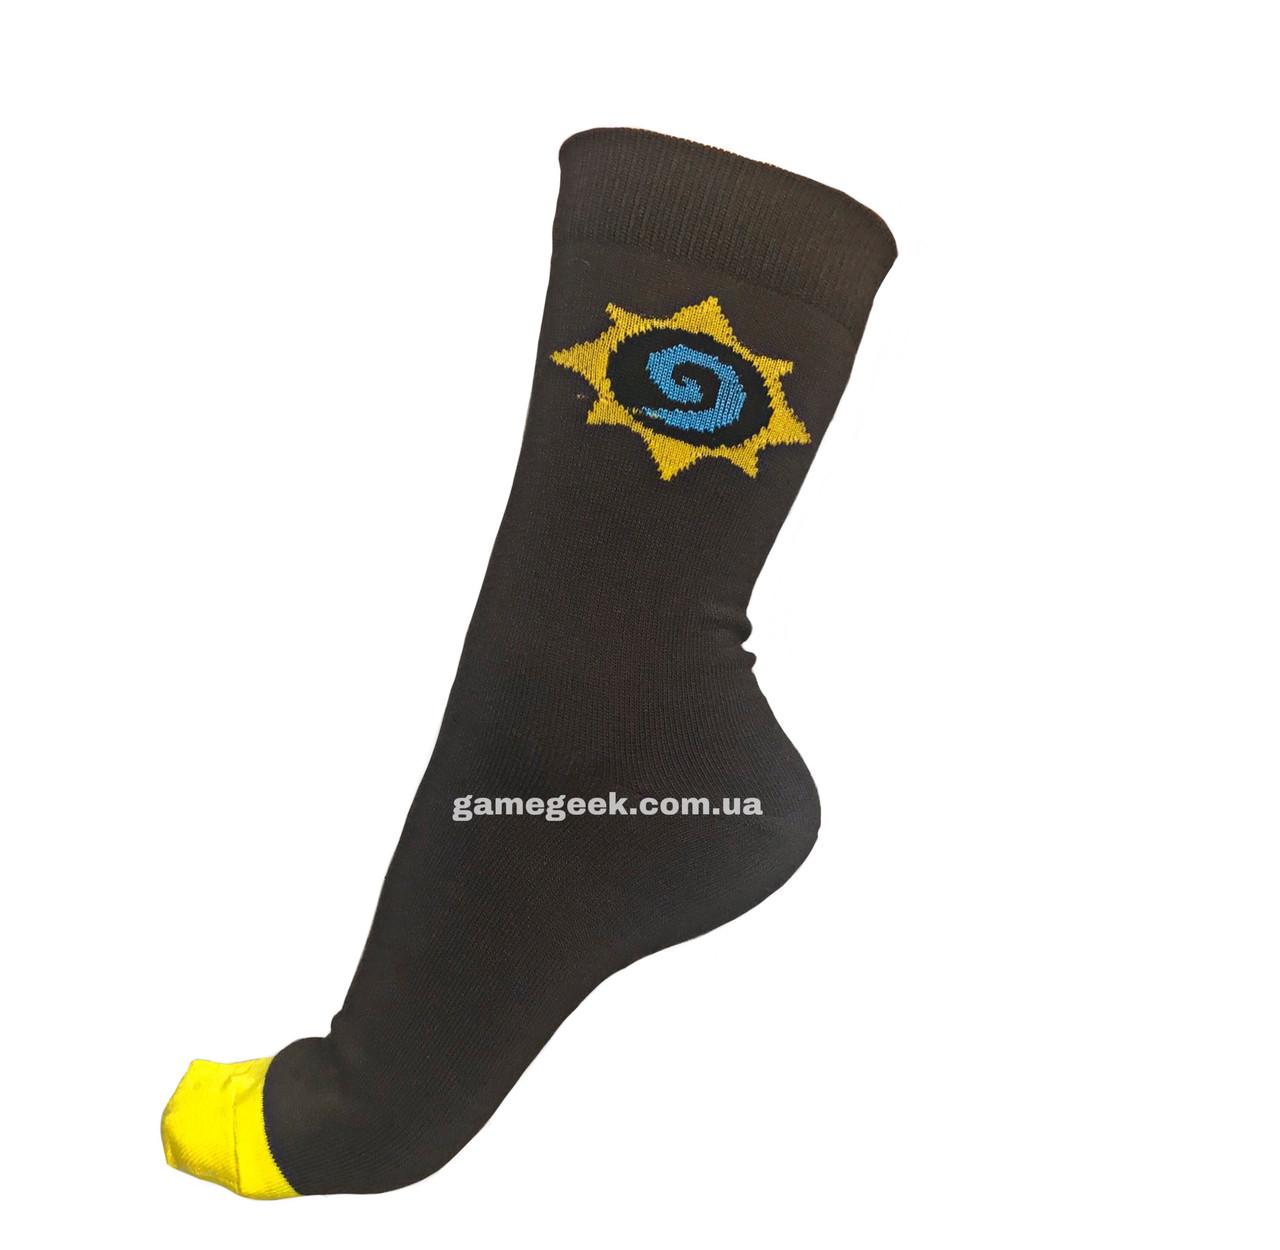 Геймерские носки Hearthstone